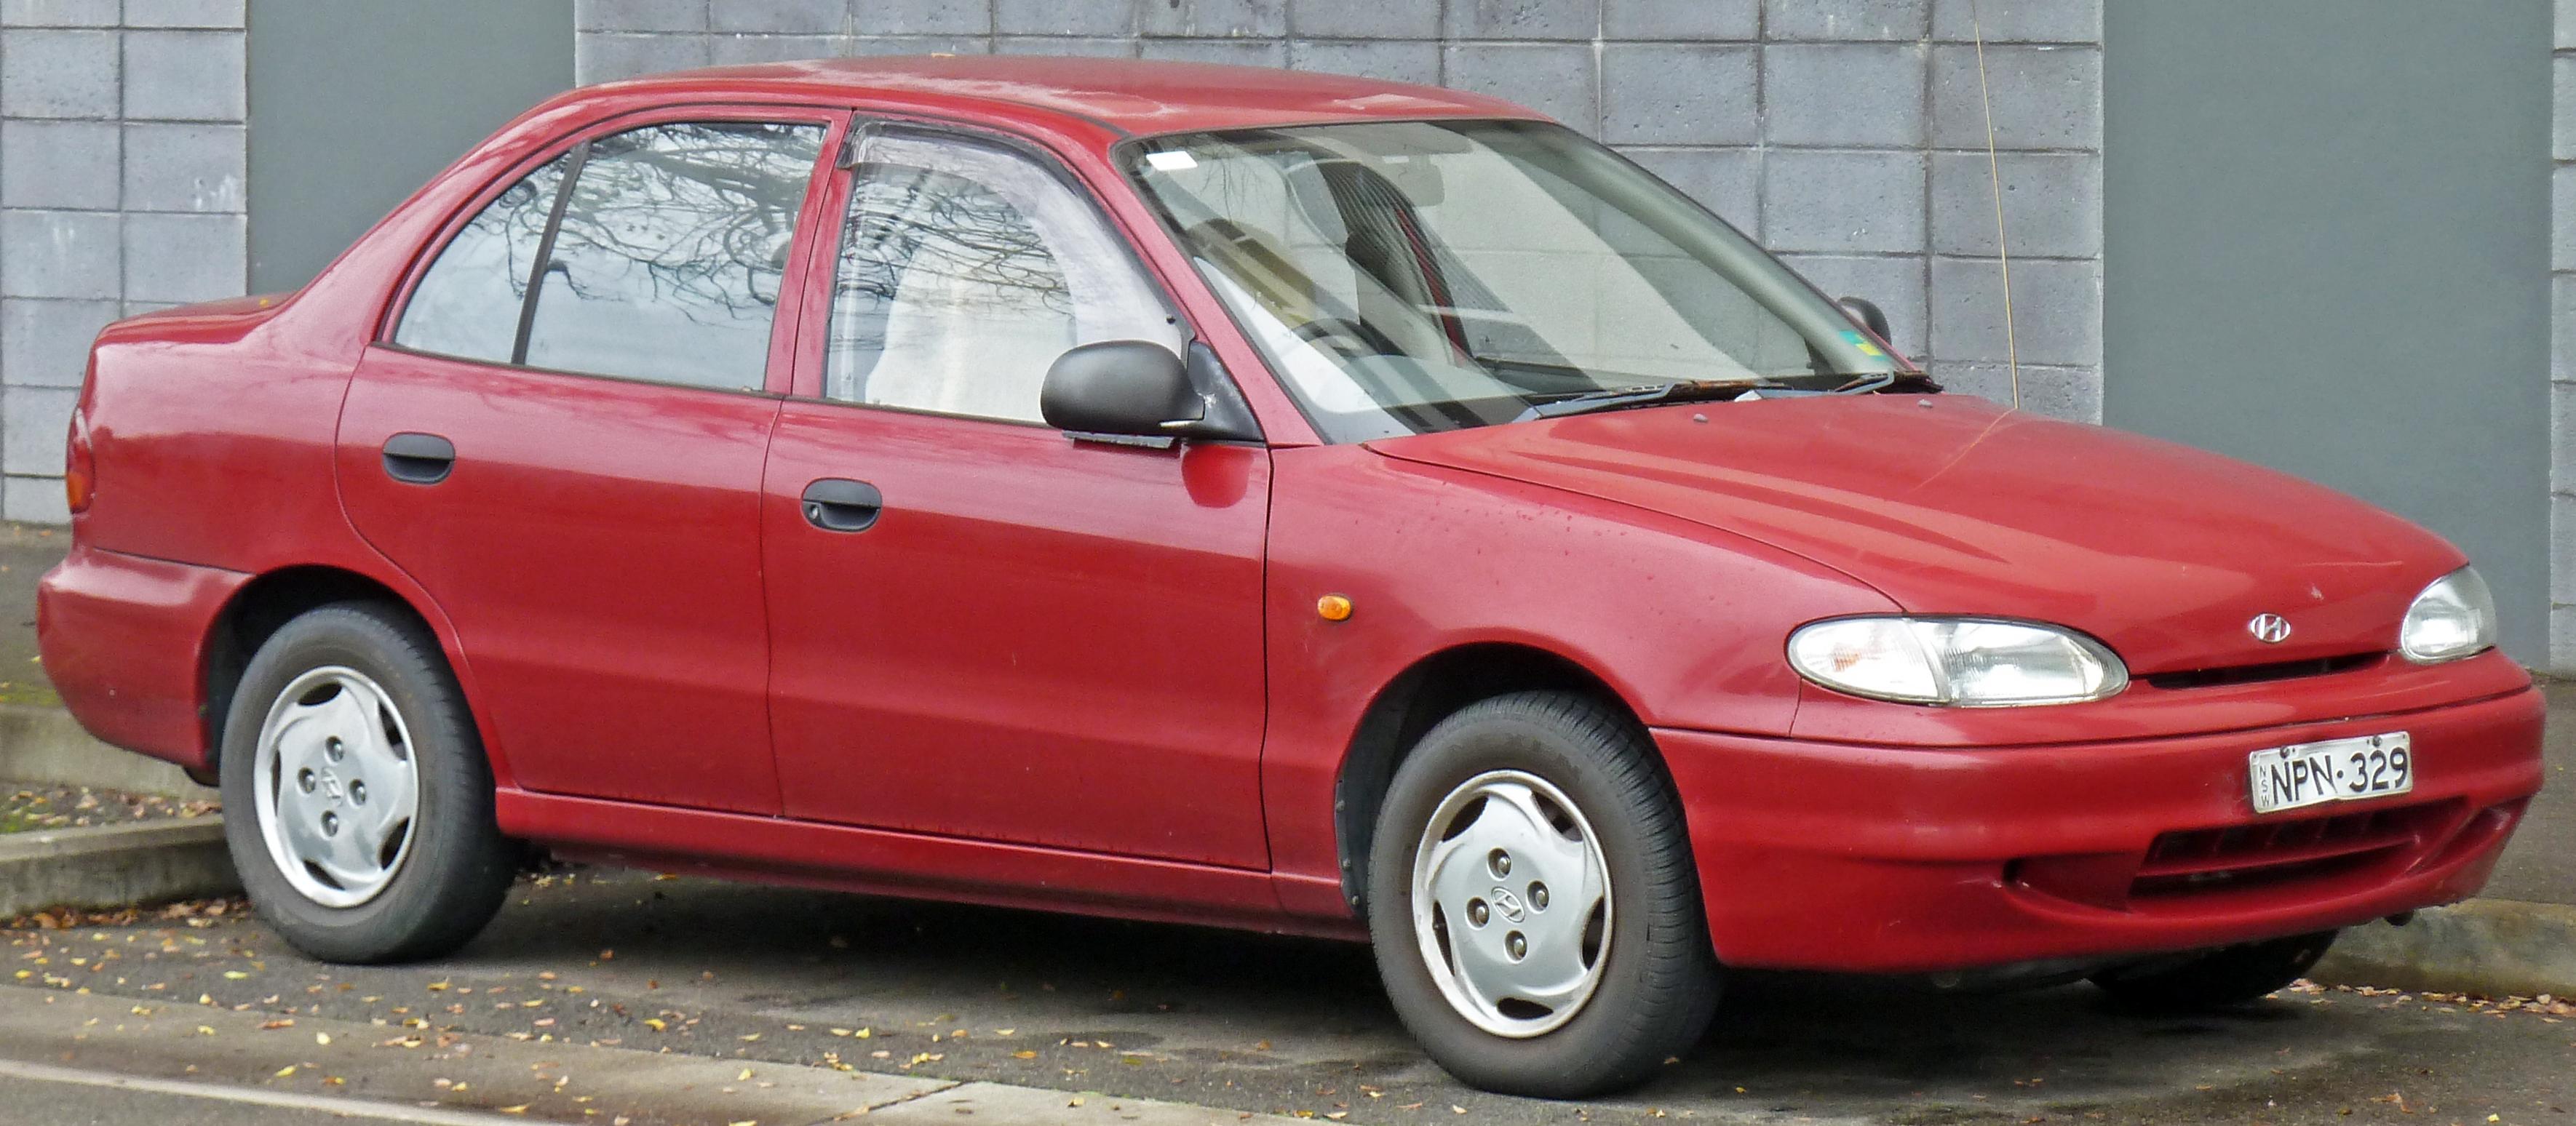 File 1994 1997 Hyundai Excel X3 Lx Sedan 2010 07 13 01